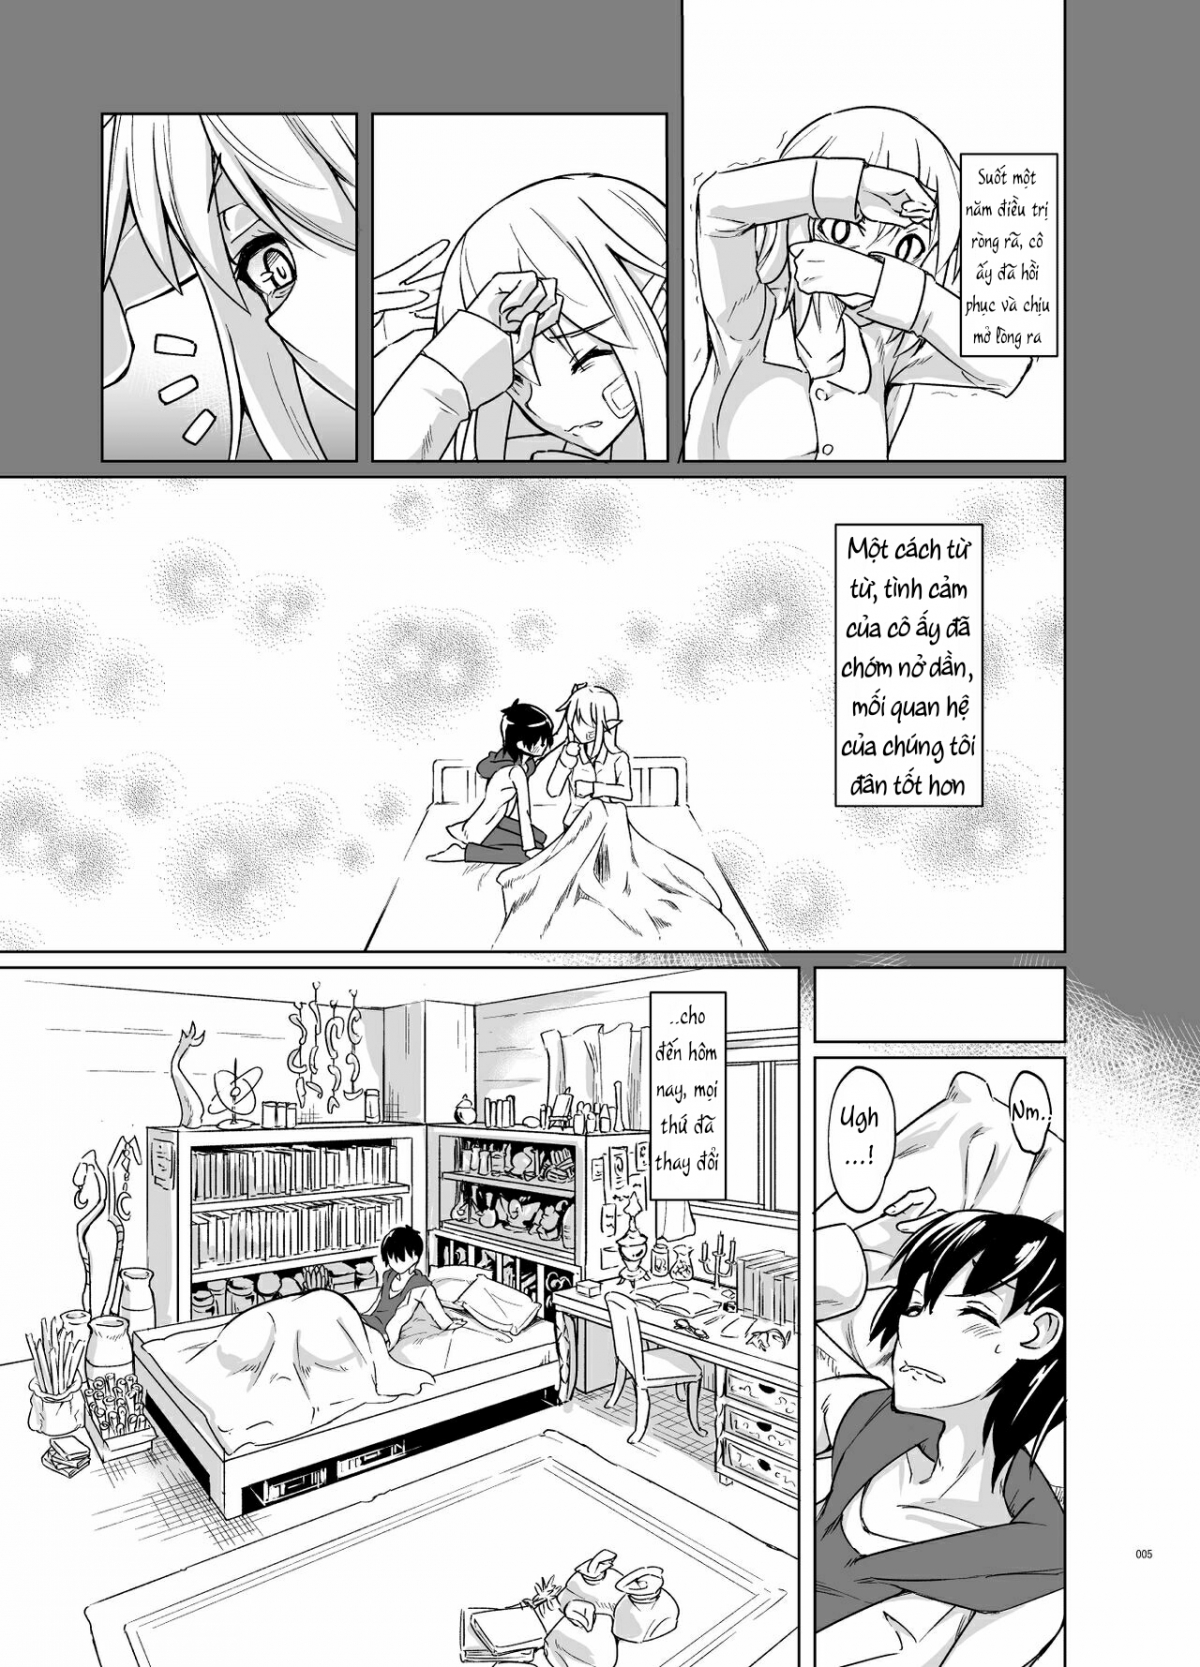 Hình ảnh  trong bài viết Toaru Elf o Hikitorimashite